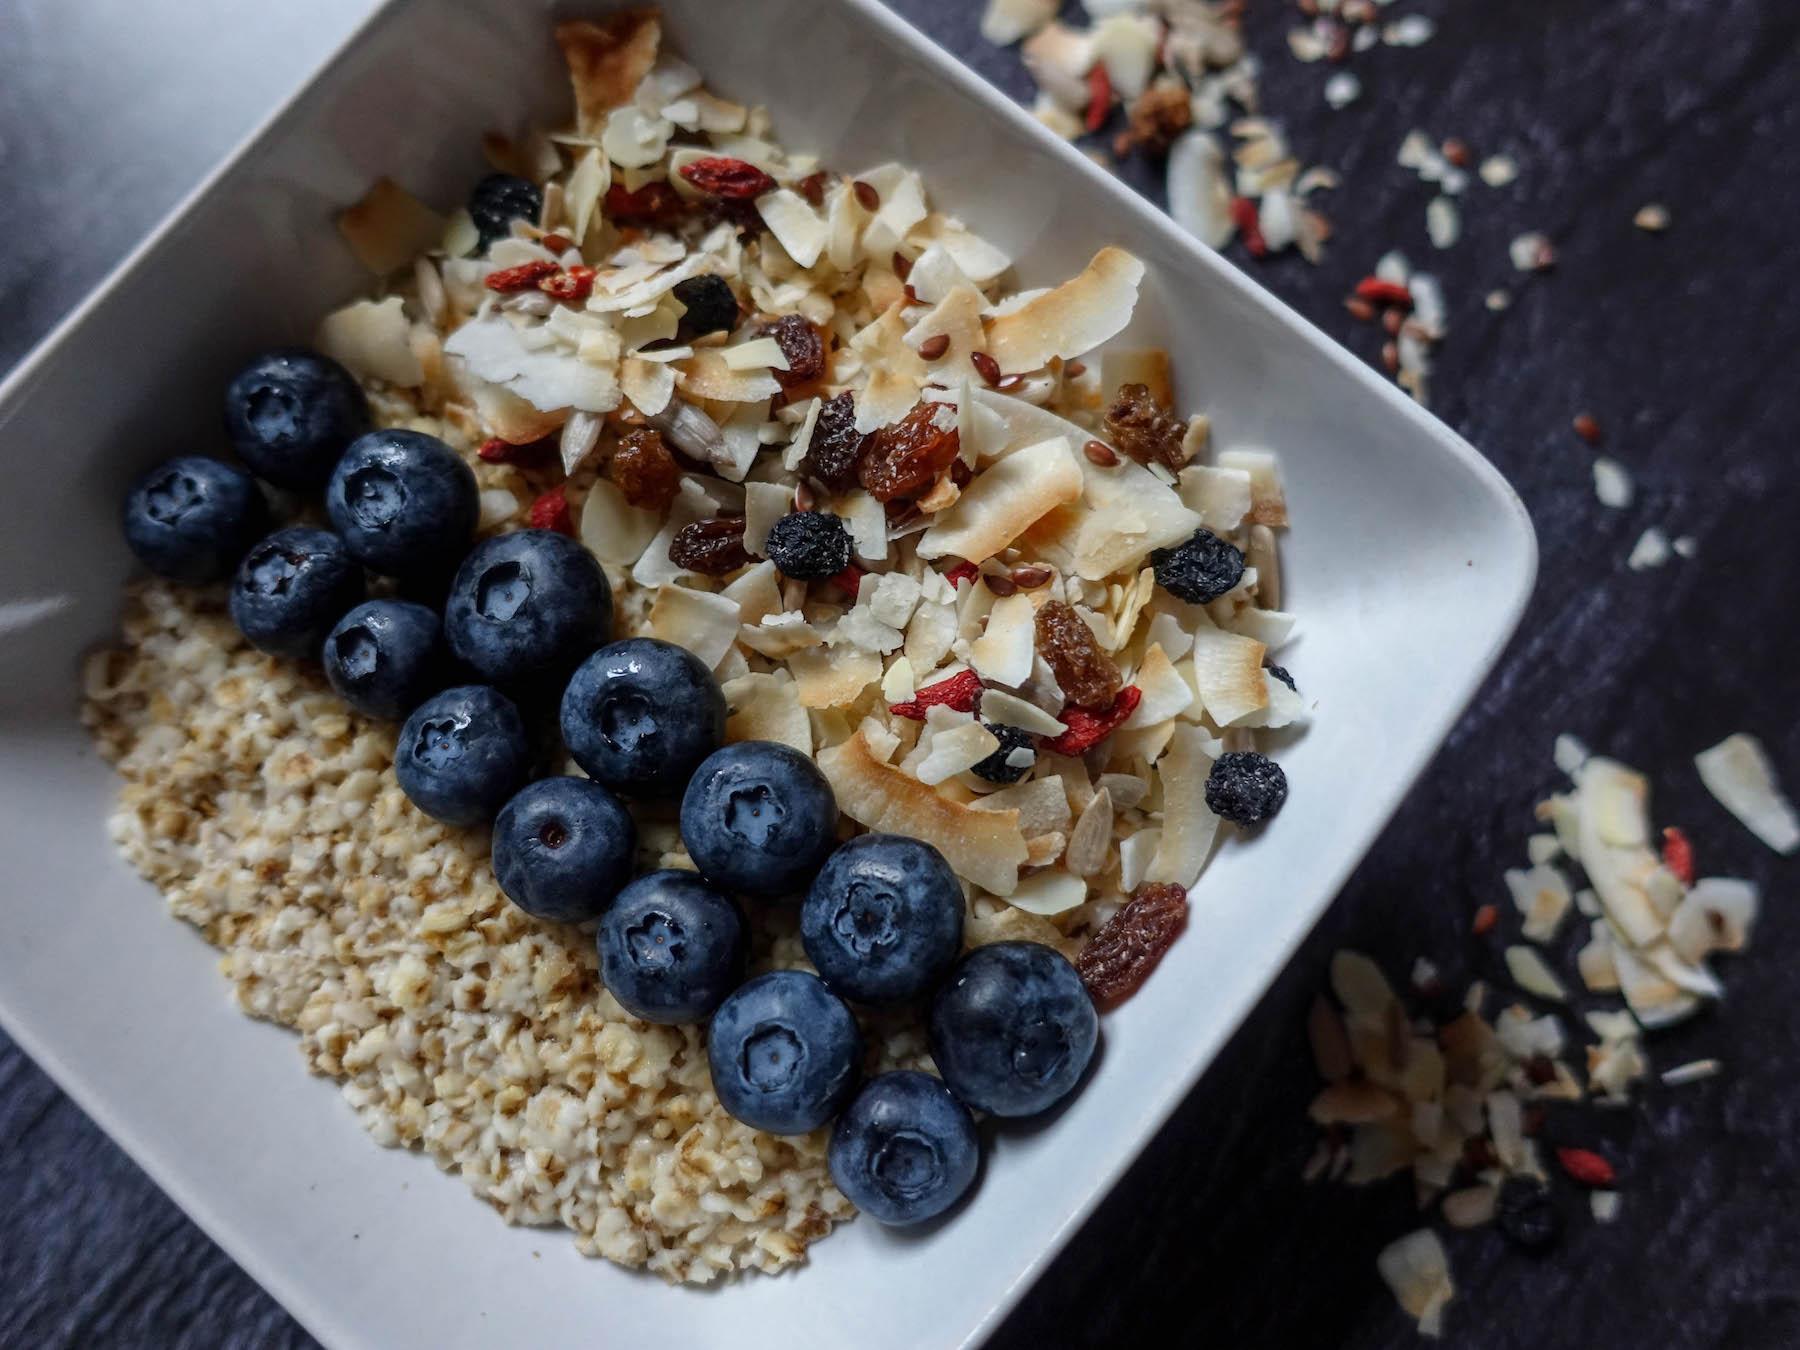 glutenfreies porridge suelovesnyc_susan_fengler_glutenfreies_porridge_glutenfrei_haferflocken